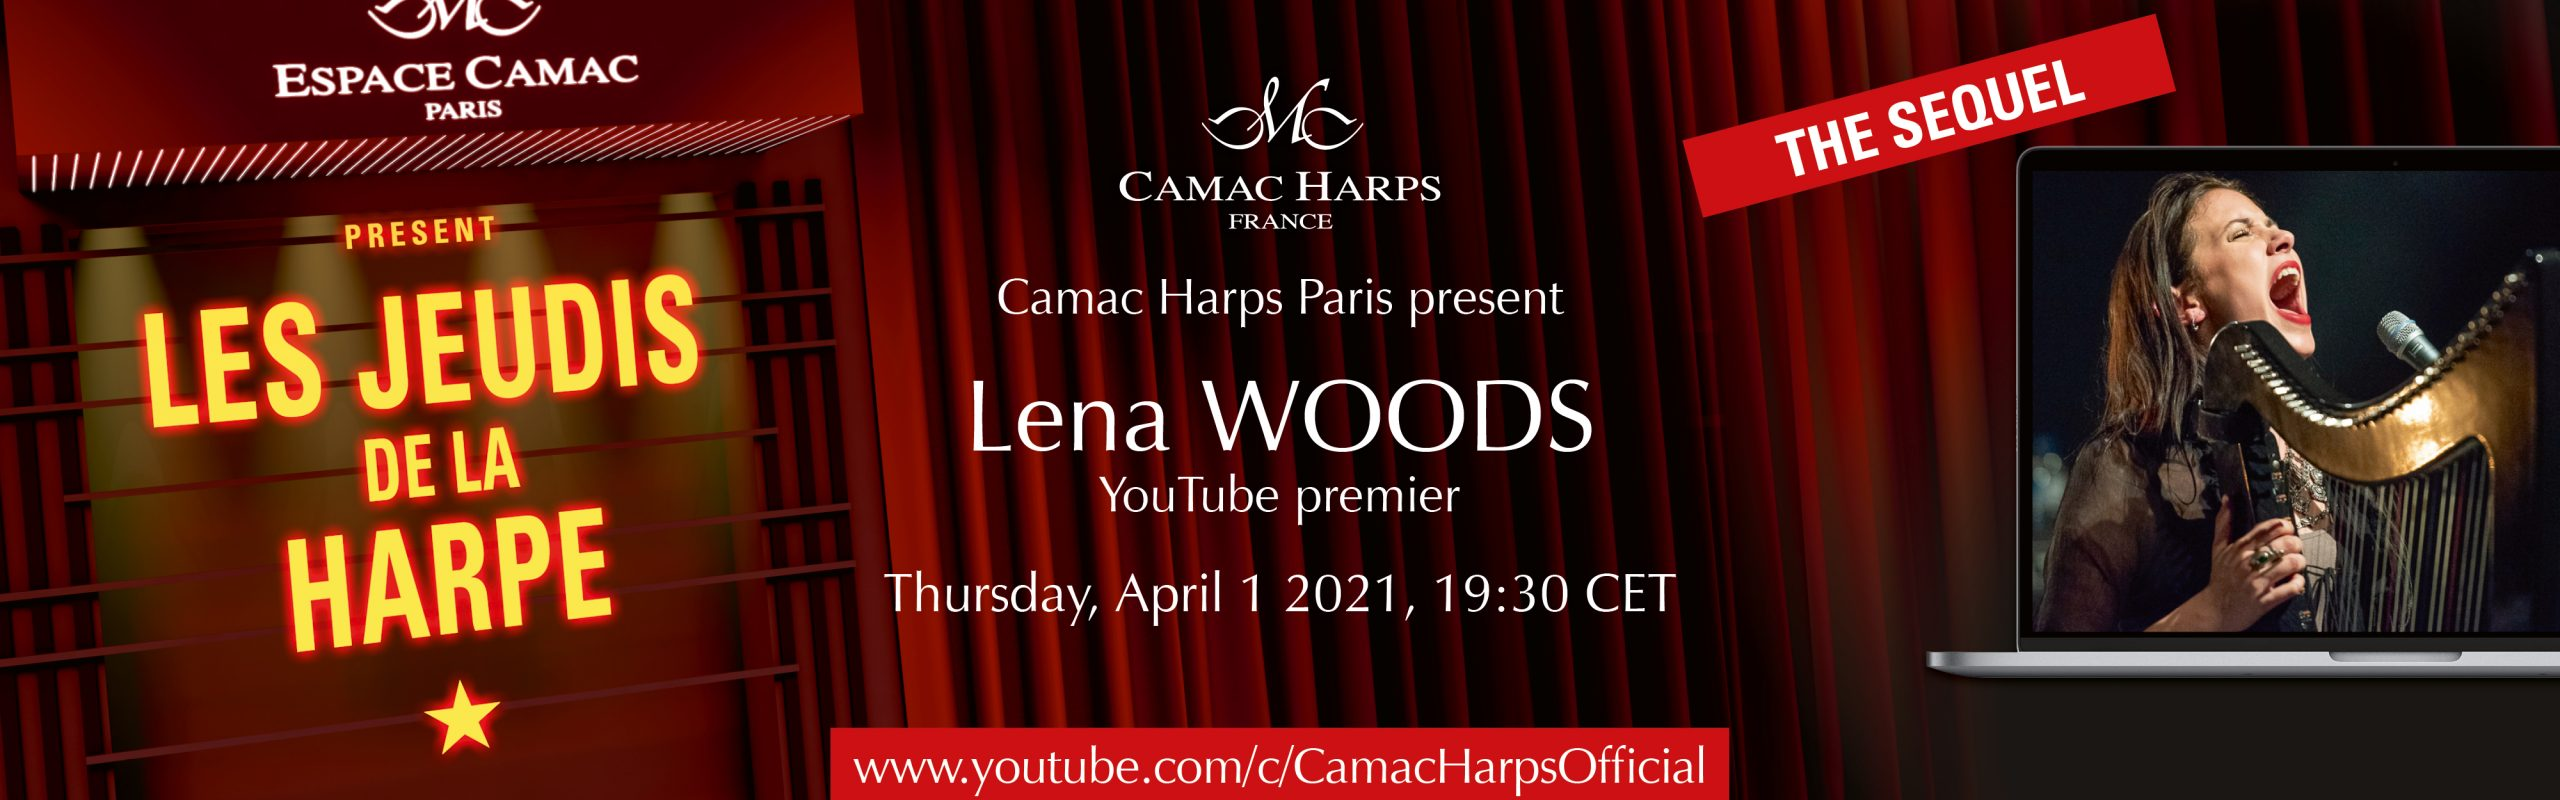 Les Jeudis de la Harpe : Lena Woods